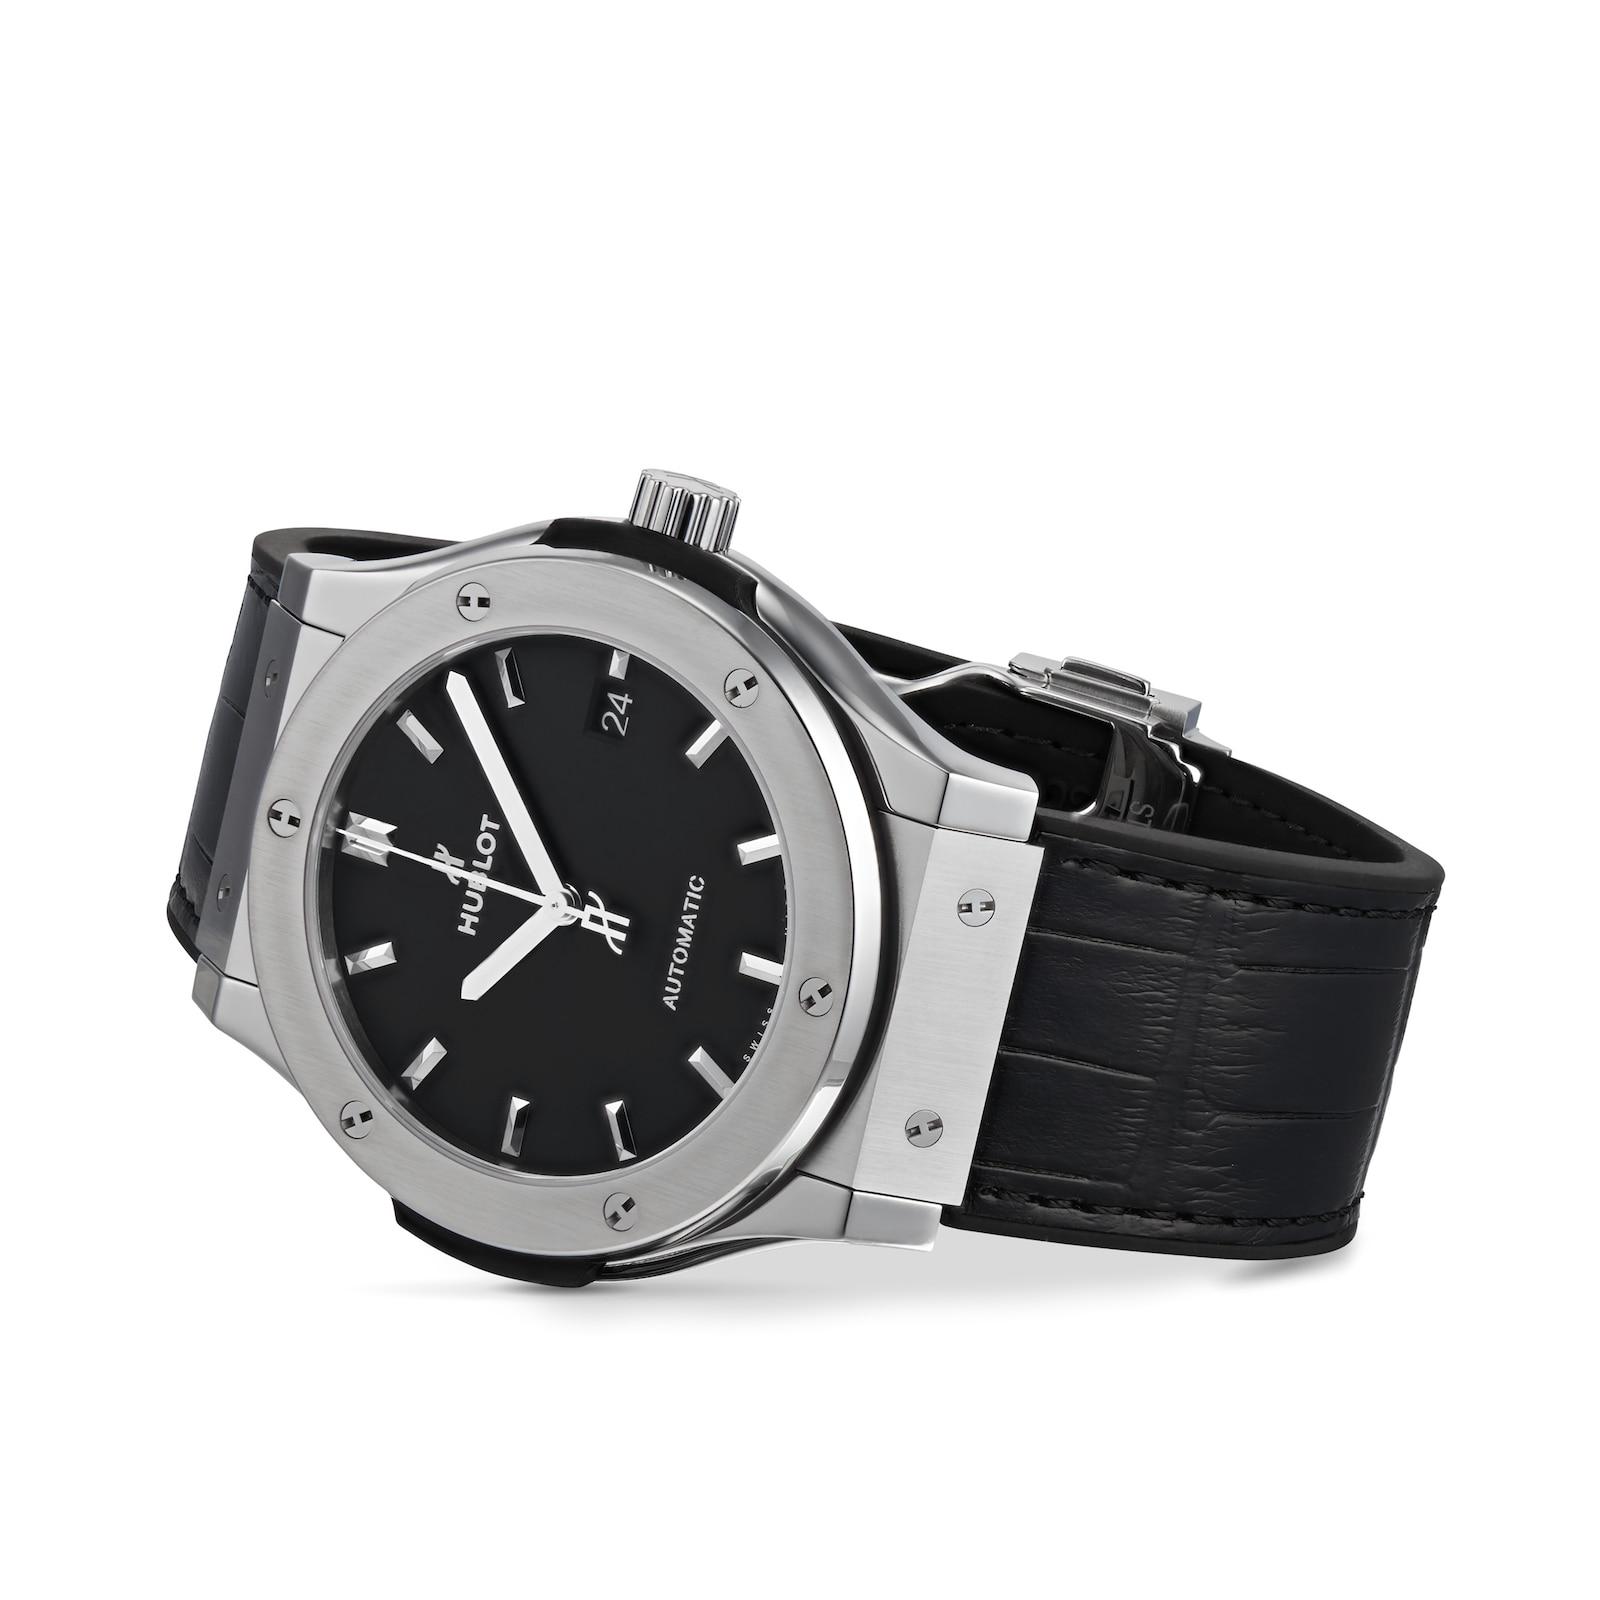 Hublot Hublot Classic Fusion Titanium 45mm Mens Watch